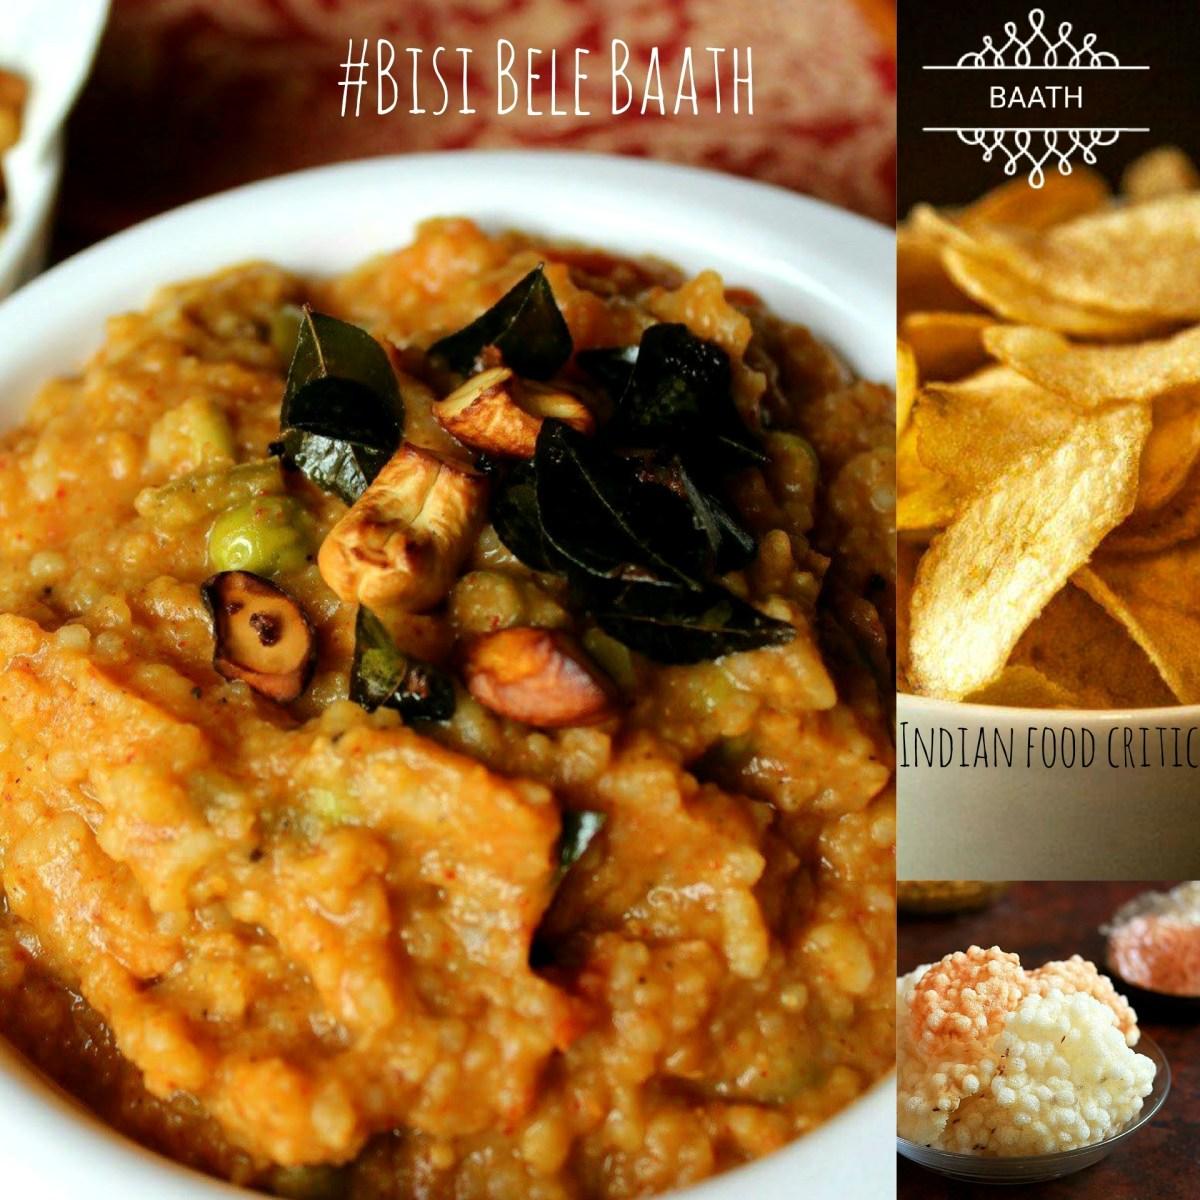 7 Bisi Bele Bath Recipes | Karnataka Style Bisi Bele Bhath | Bisibele Bath | Bisibela Bath | Sambar Rice | 4.6/5.0